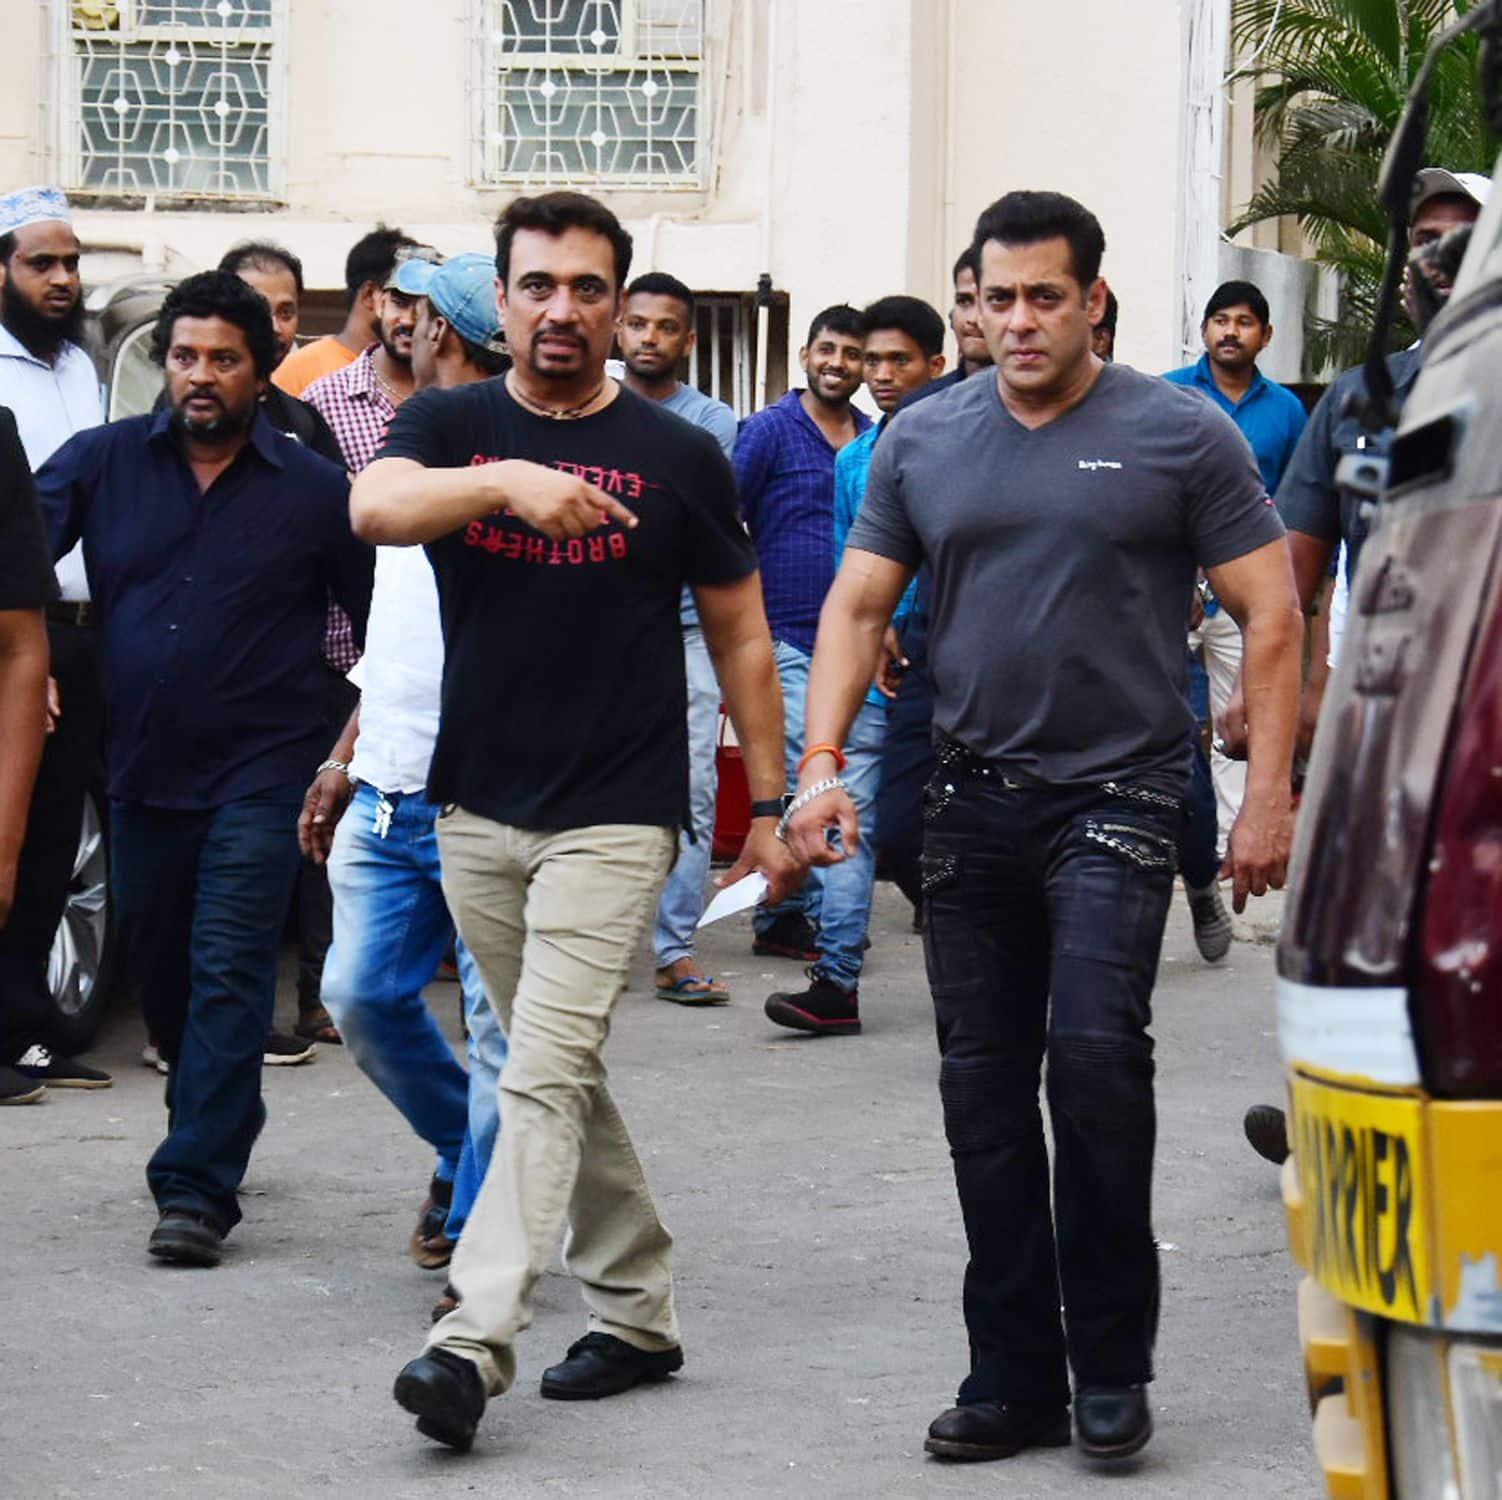 सलमान खान 'भारत' को लेकर उत्साहित